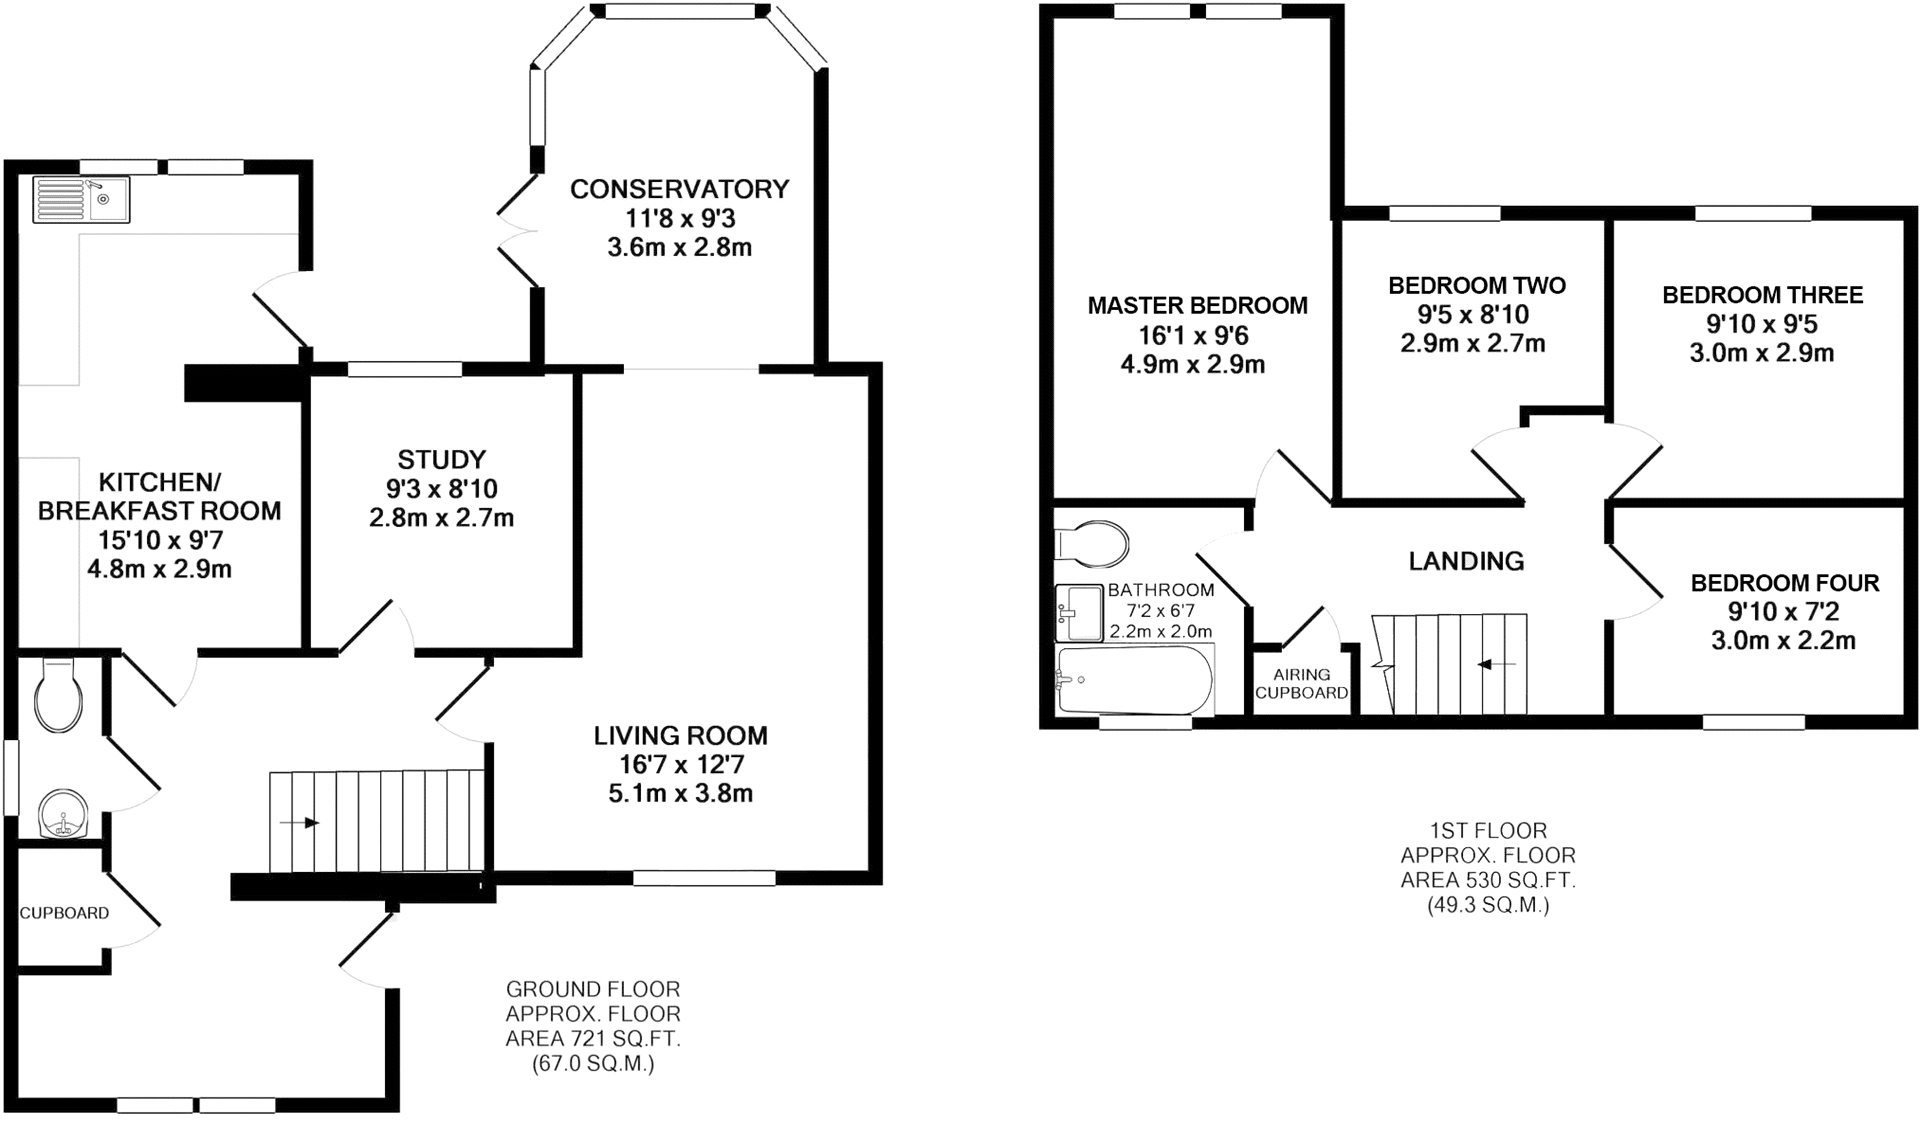 4 Bedrooms Detached house for sale in Octavia, Bracknell, Berkshire RG12